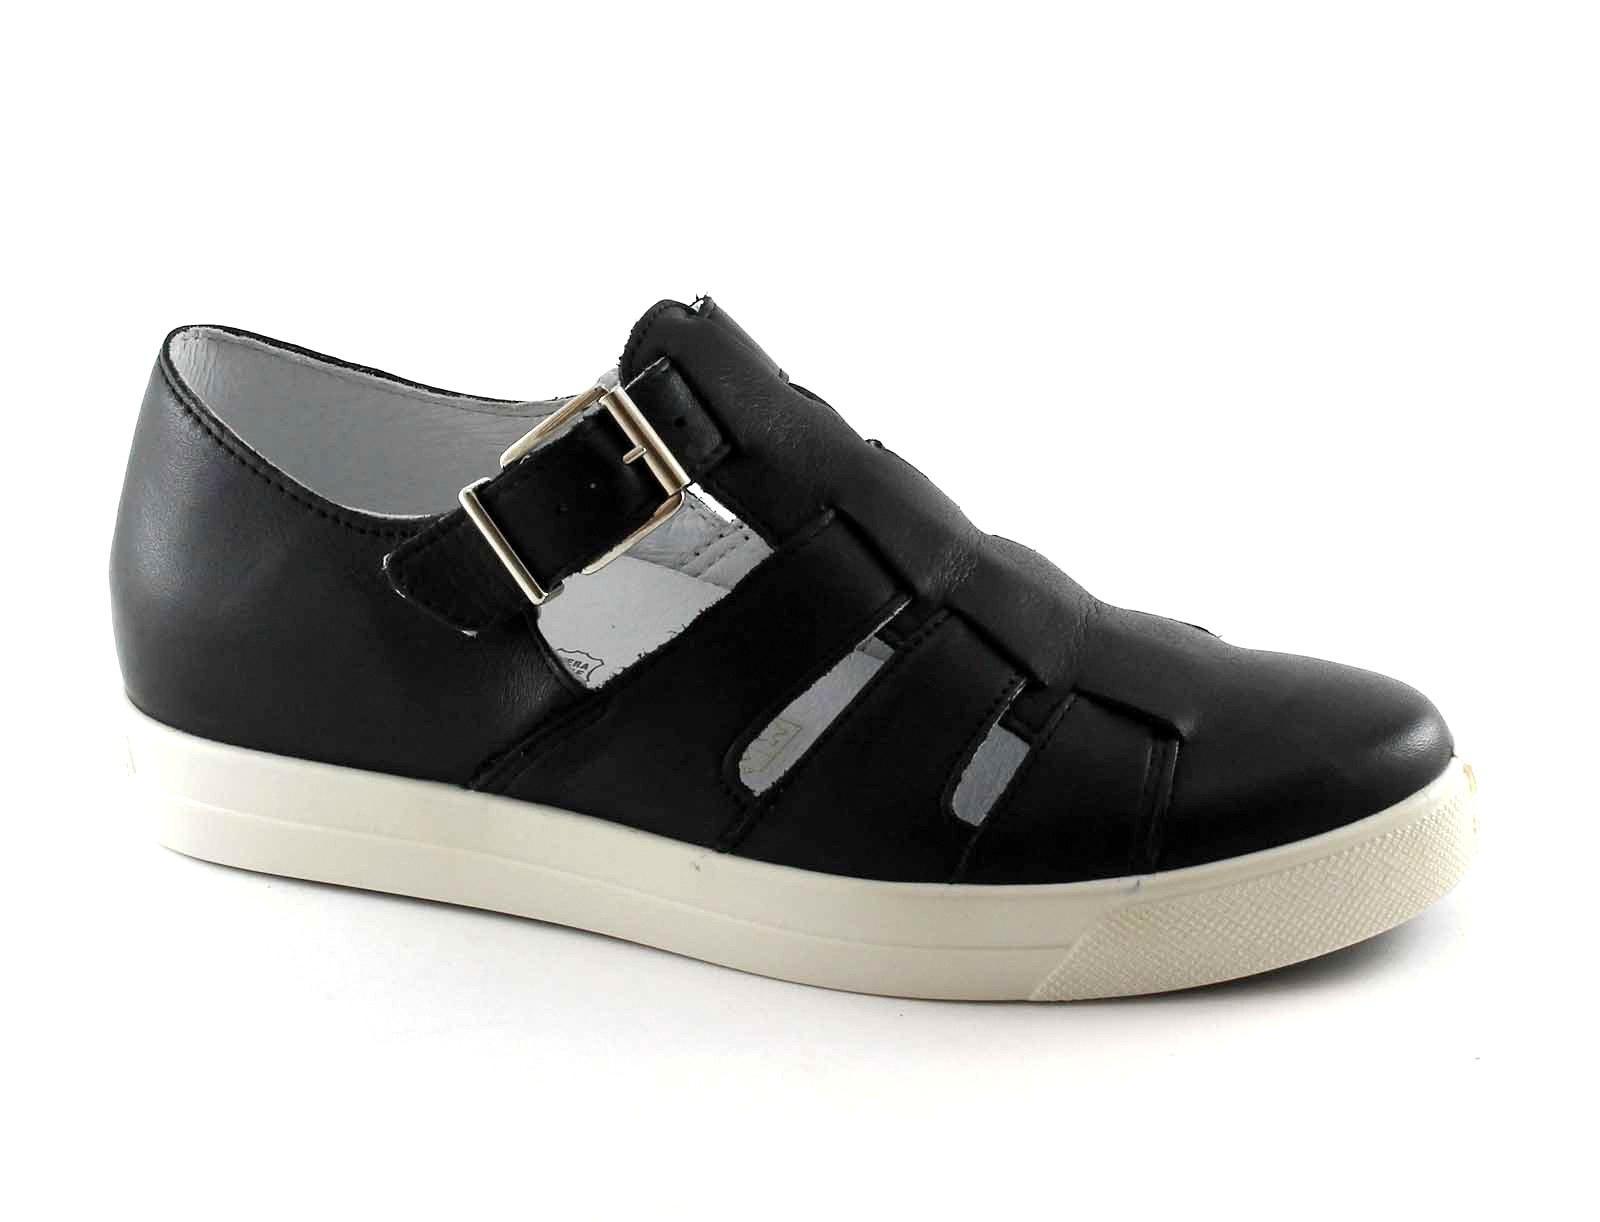 IGI&CO 77890 nero pelle scarpe sandalo donna fibbia pelle nero cut out 545090